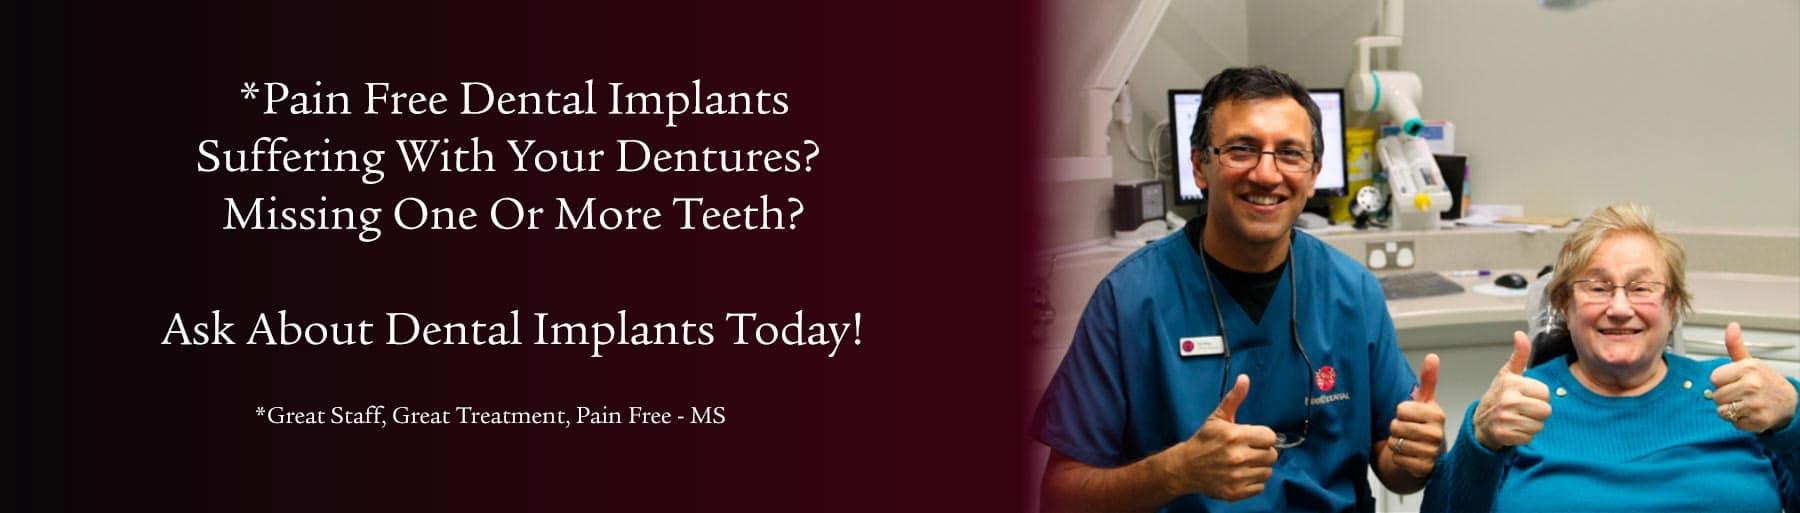 Banner Implants